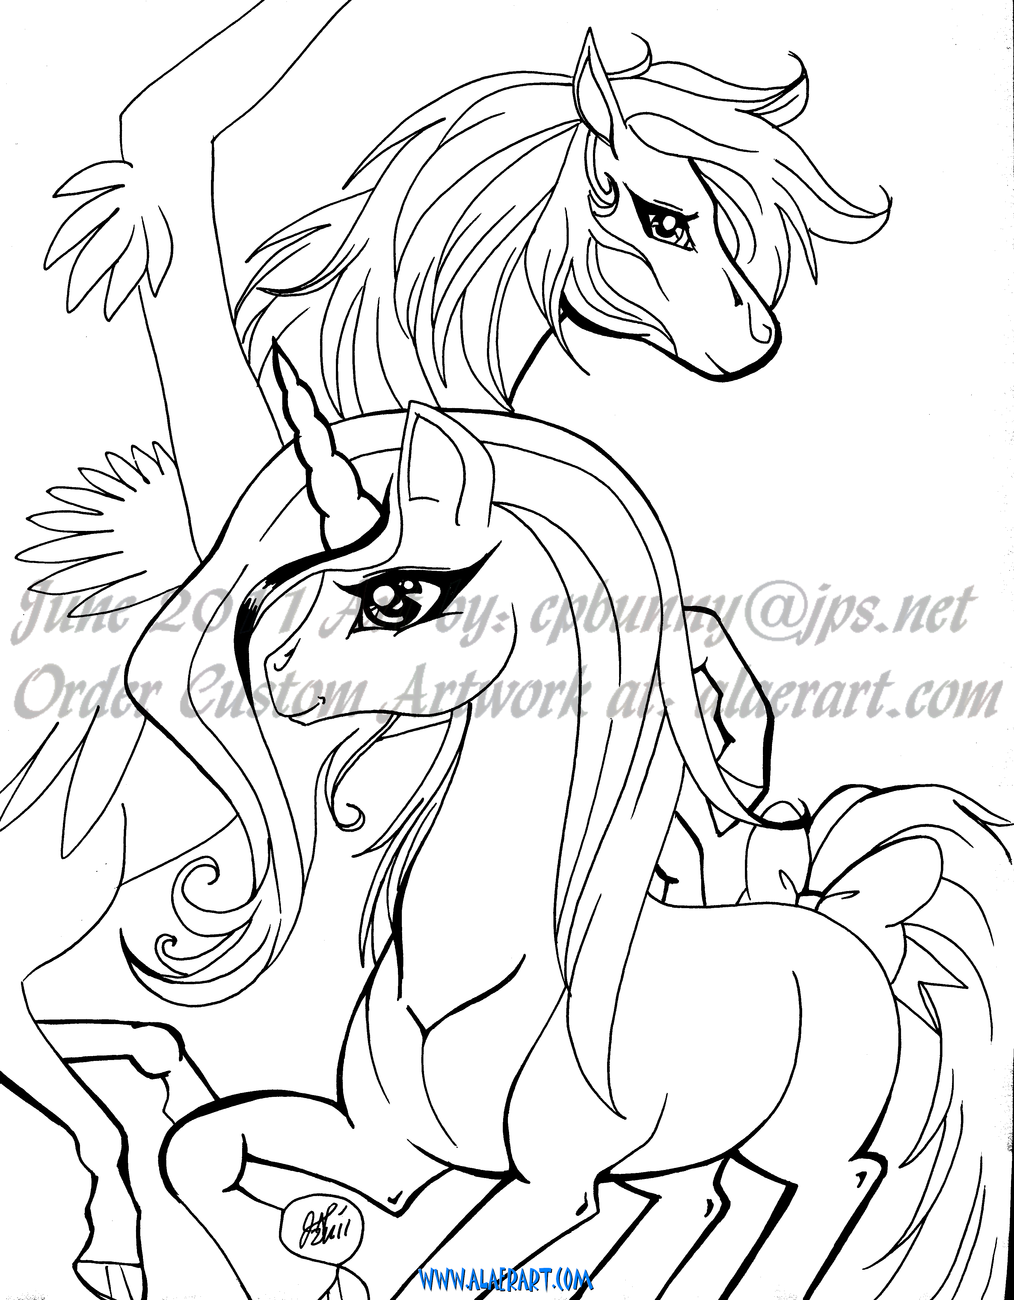 Fantasy Rainbow Unicorn & Curious Bunny Rabbit Originals + Prints Fan Art 5pc!